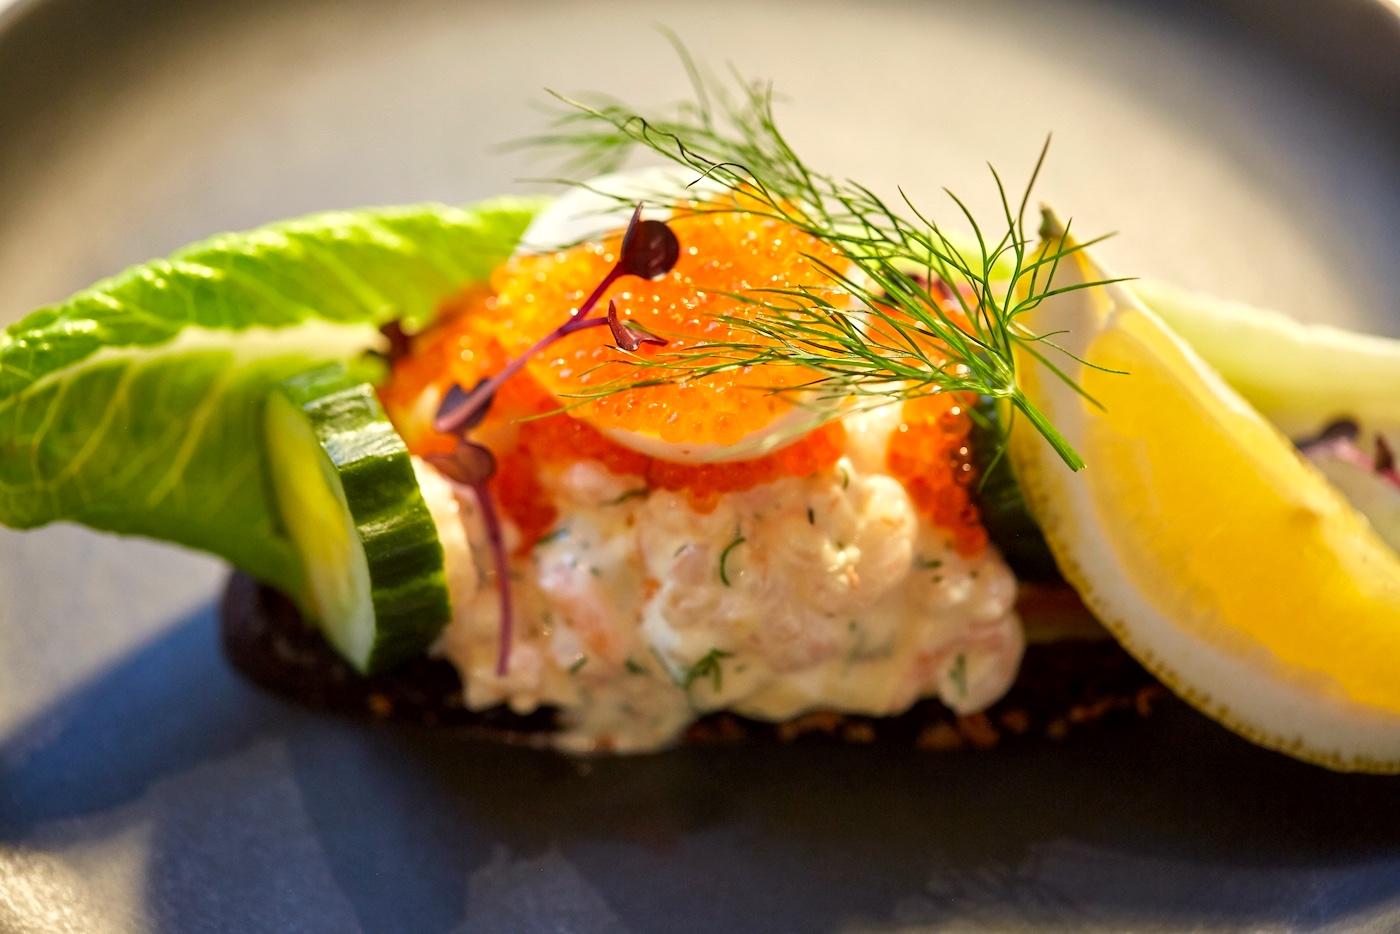 Close-up of Swedish shrimp sandwich.